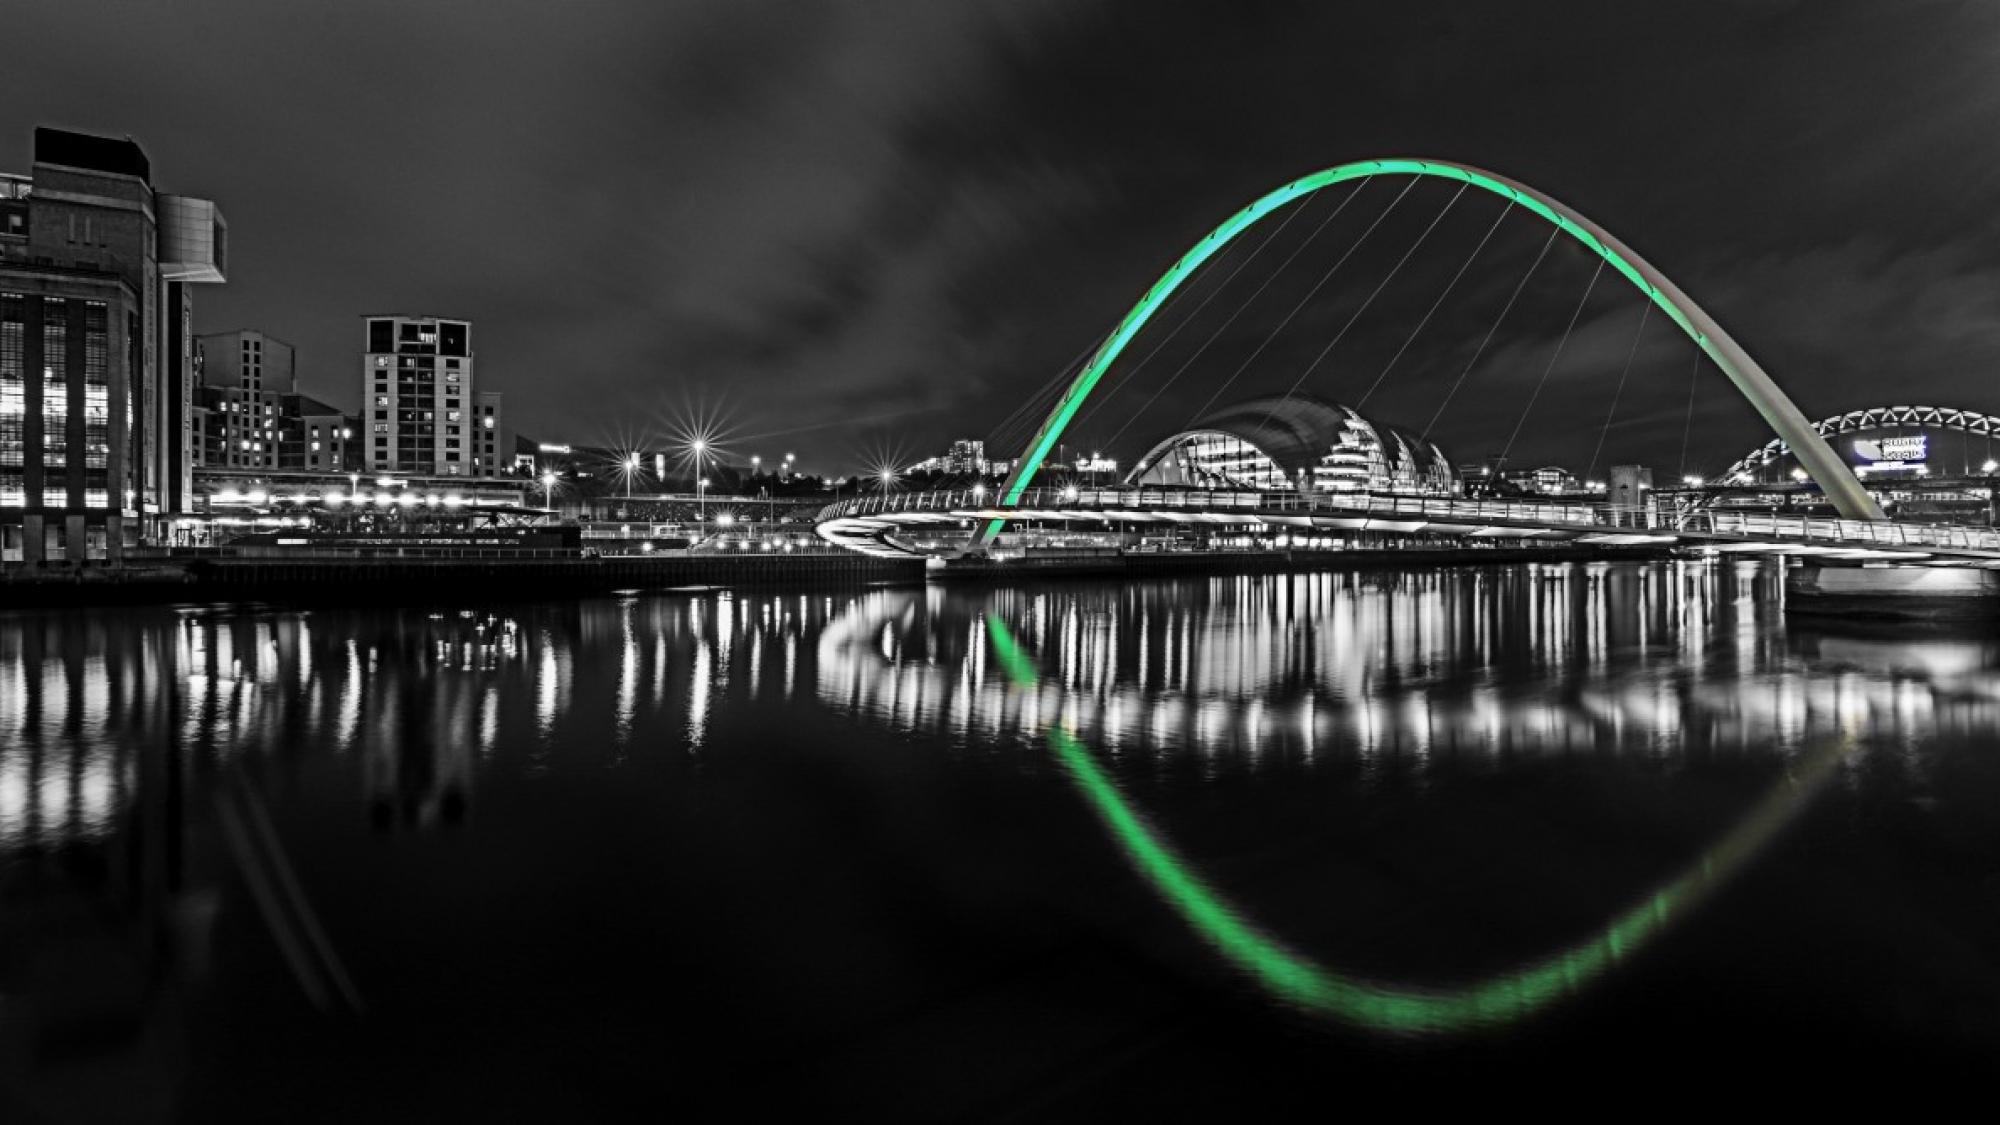 newcastle_upon_tyne_night_reflections_bridge_north_east_england-589244